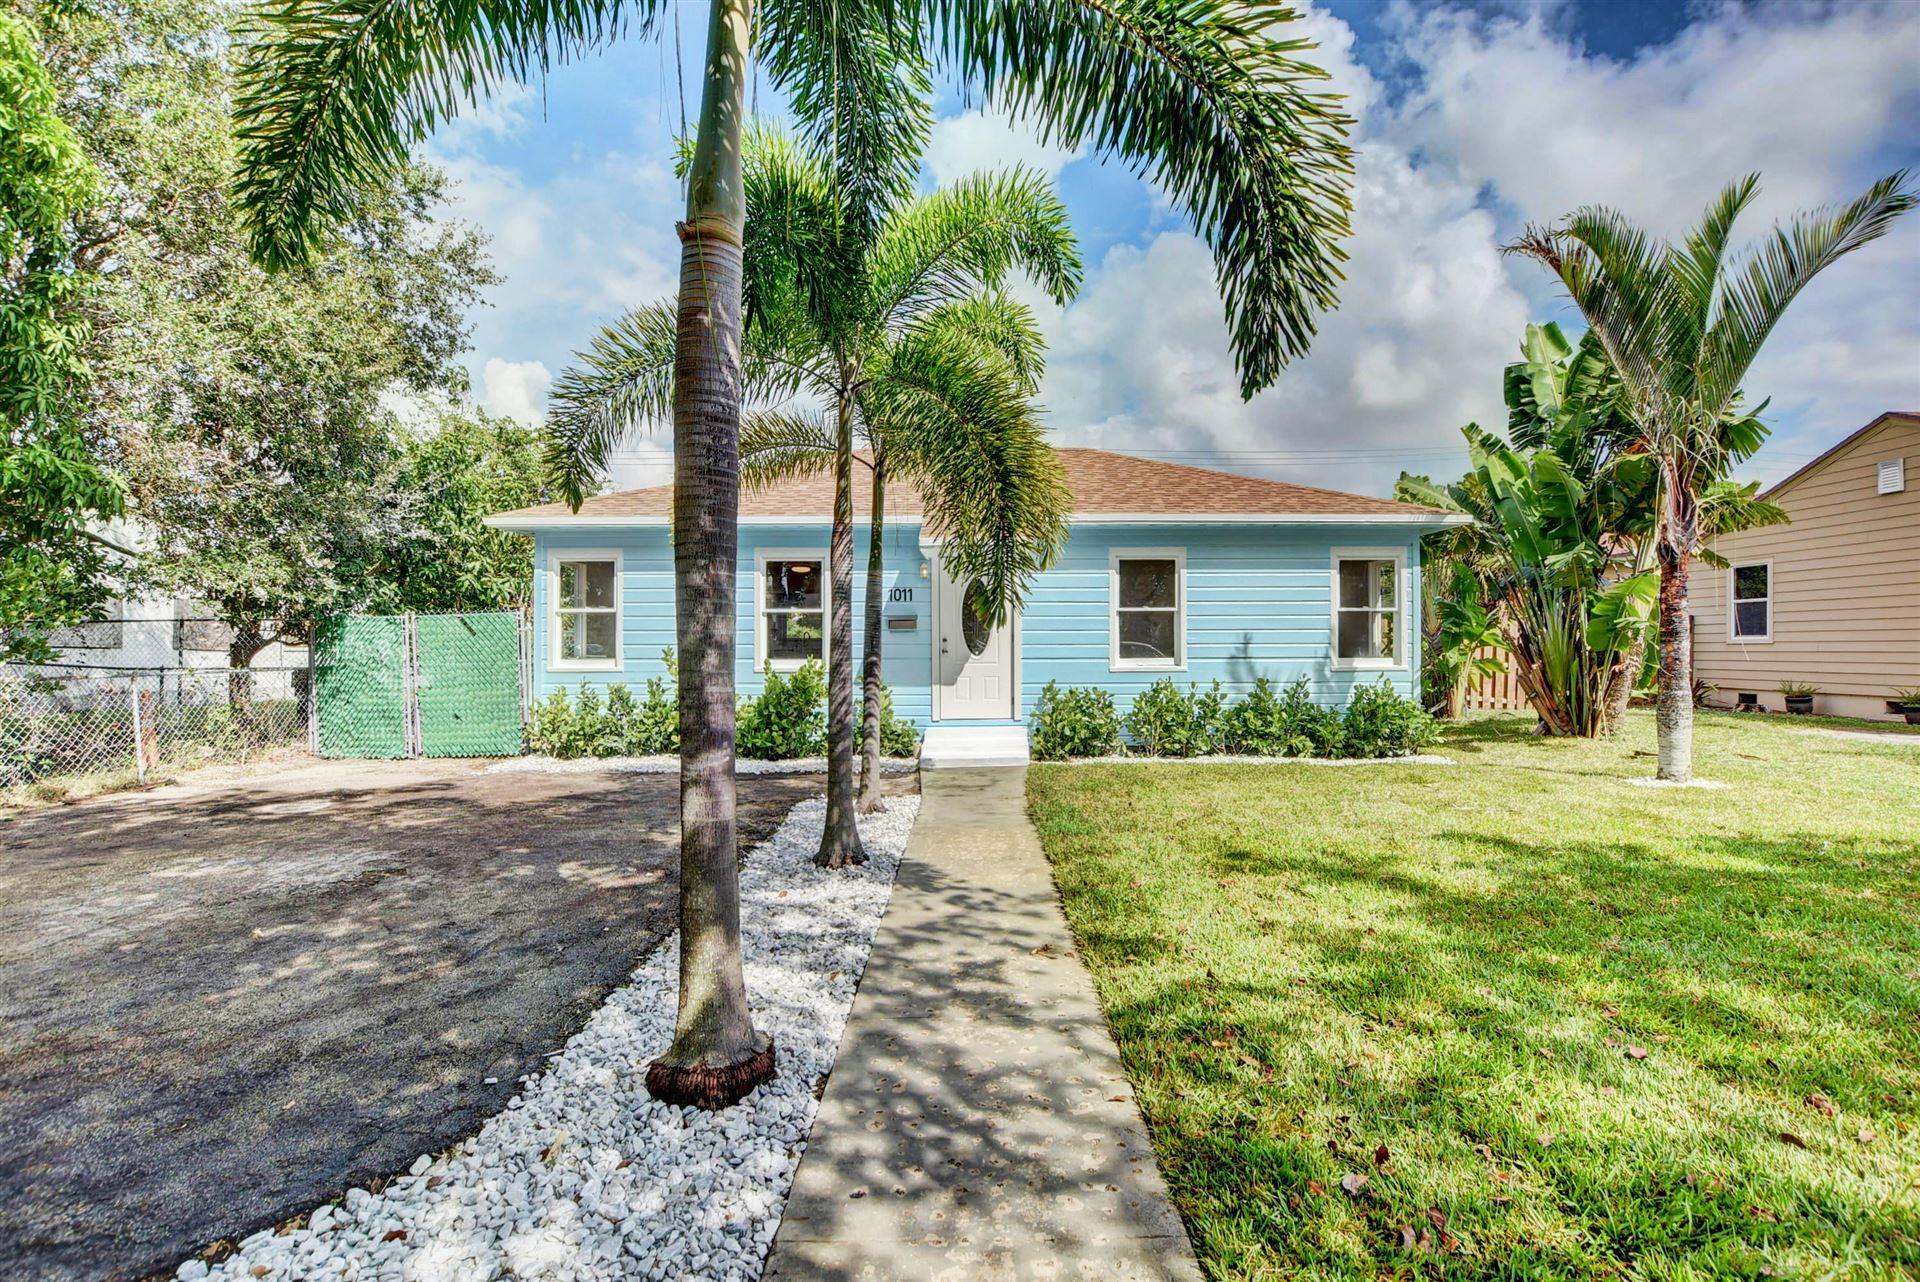 1011 Avon Road, West Palm Beach, FL 33401 - #: RX-10626205